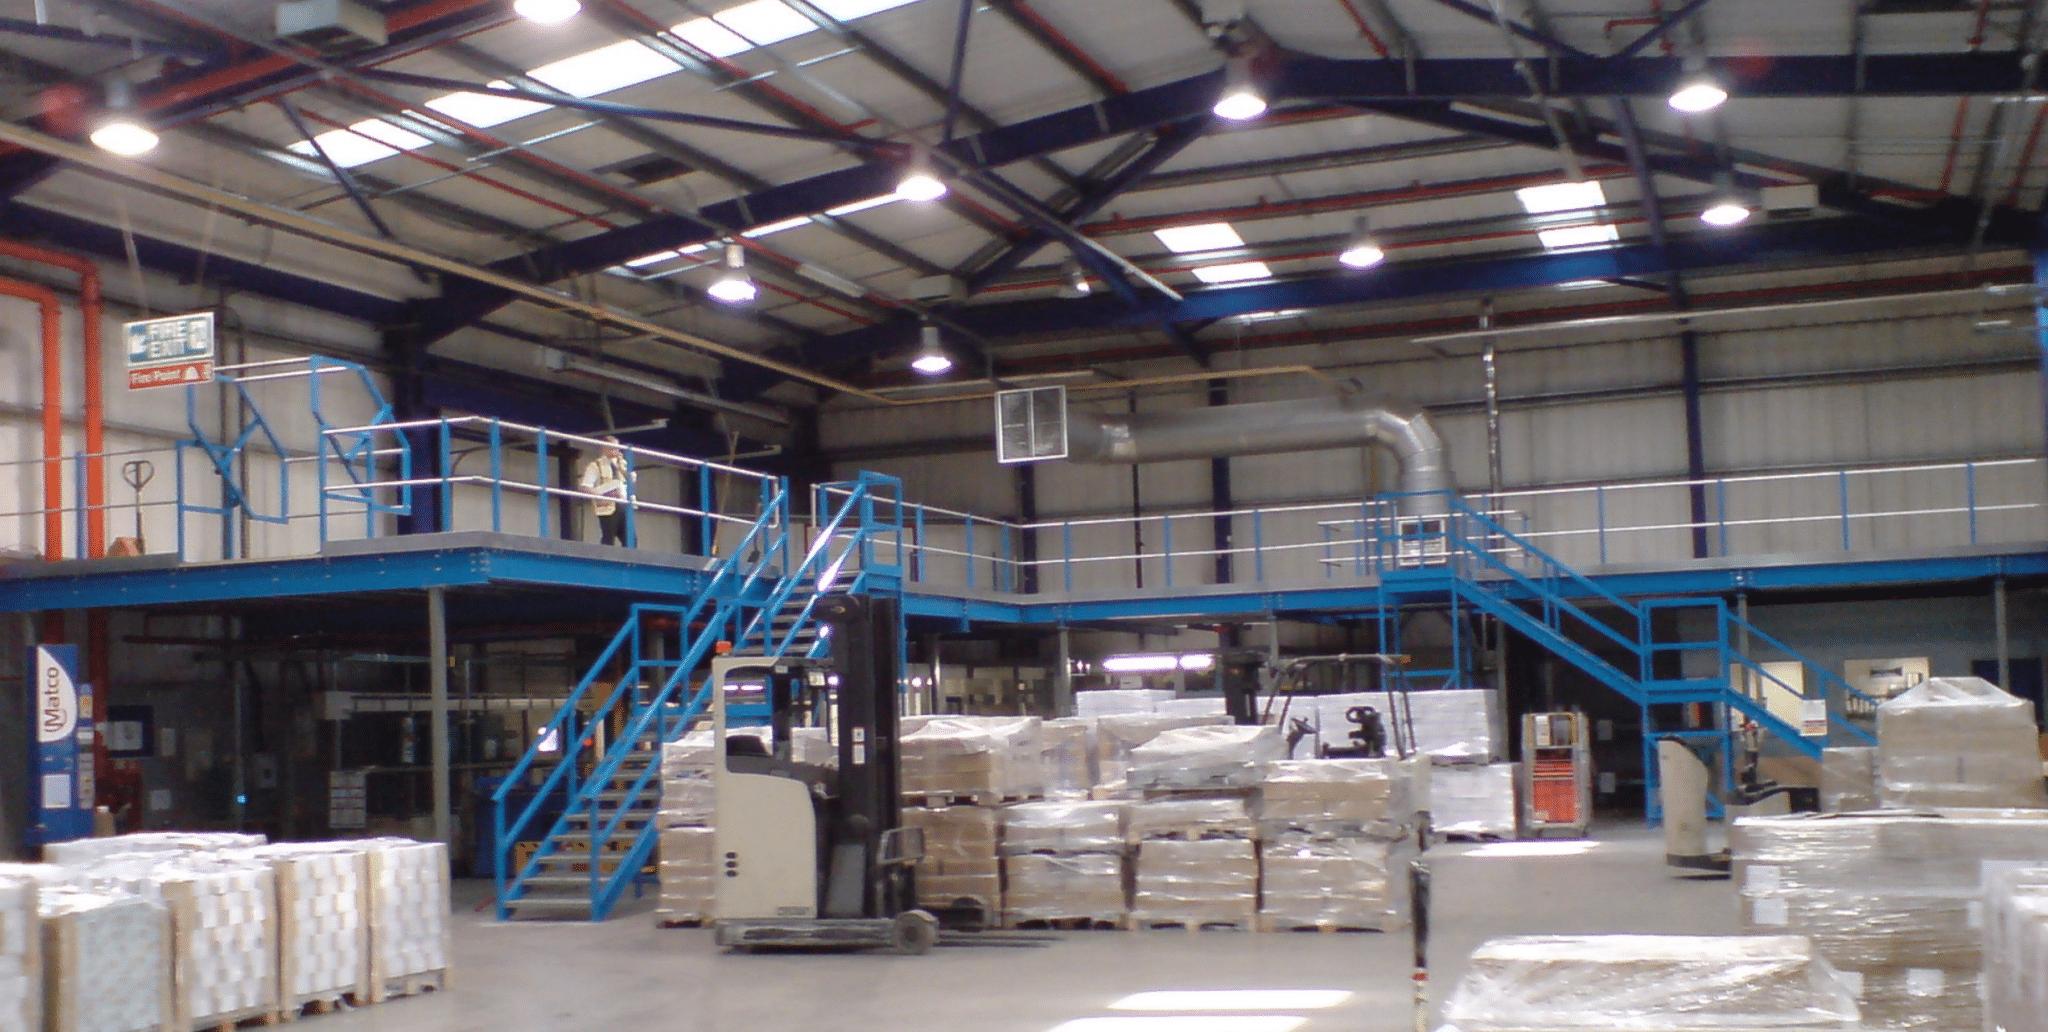 Mezzanine Floor Considerations